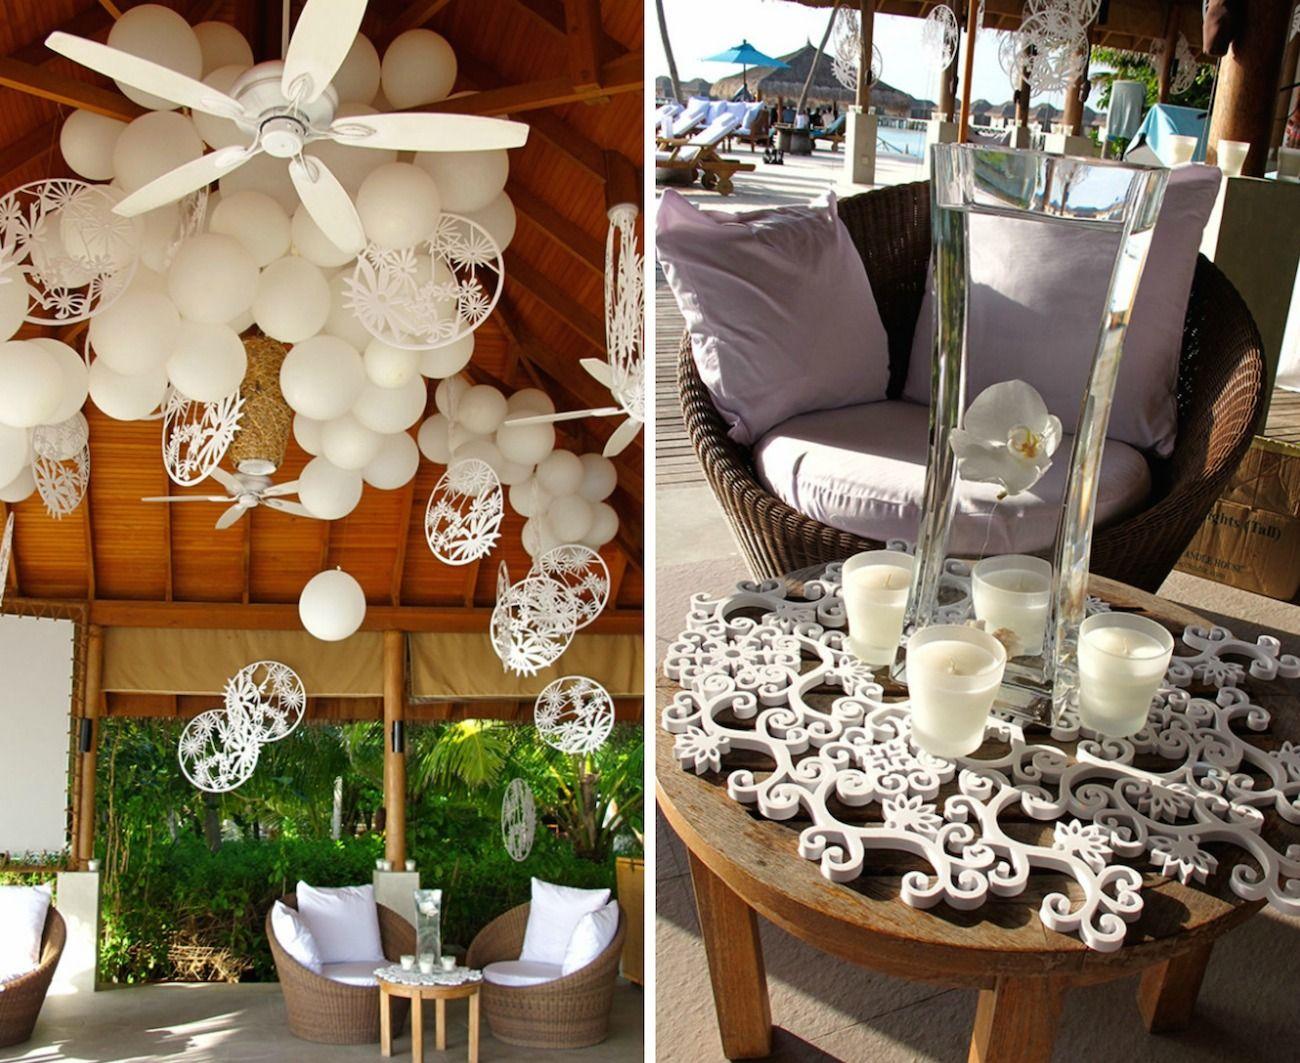 Exotic wedding maldives wedding white party 4 de plan v de plan v exotic wedding maldives wedding white party 4 junglespirit Choice Image